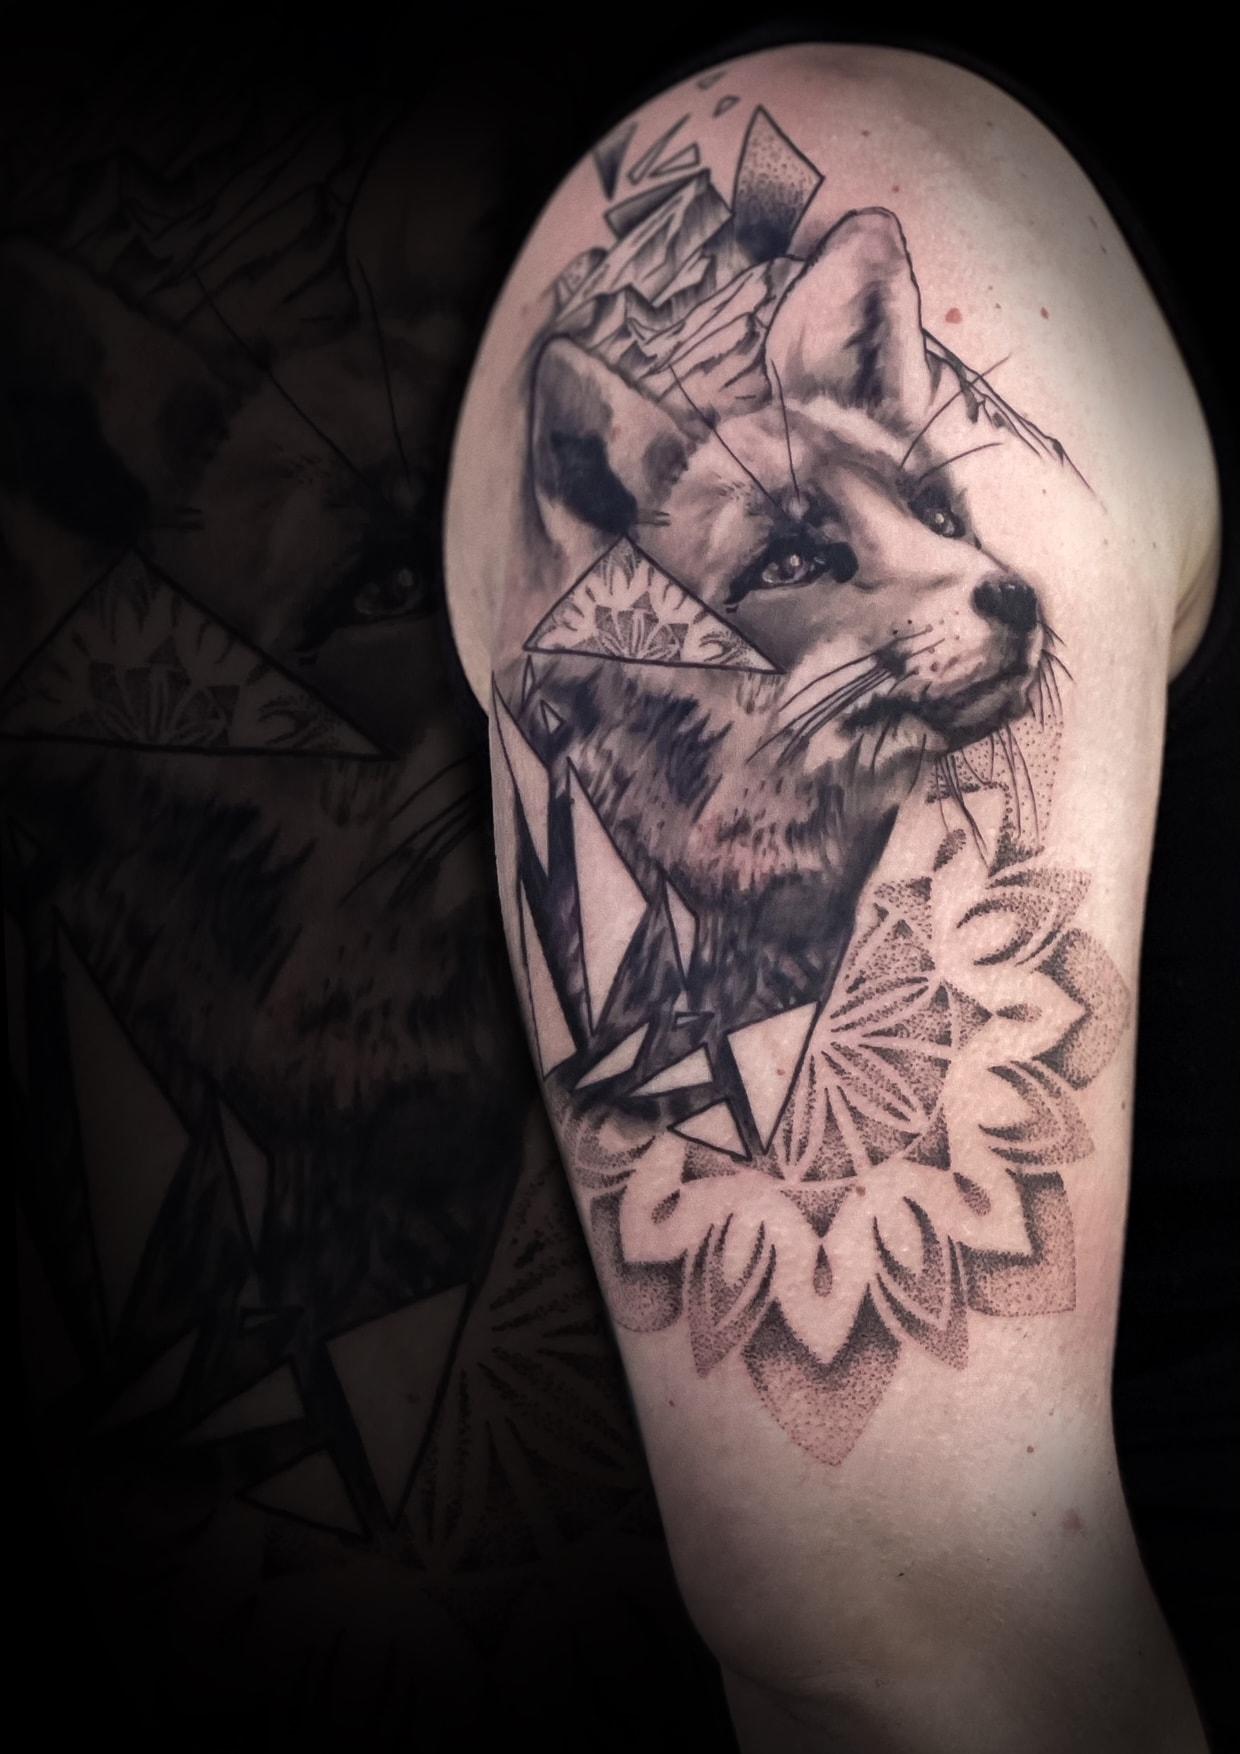 Fuchs, Mandala, realistisch, geometrisch, Van de Rutter Tattoostudio, tätowieren, Tattooarist, 9020 Klagenfurt am Wörthersee